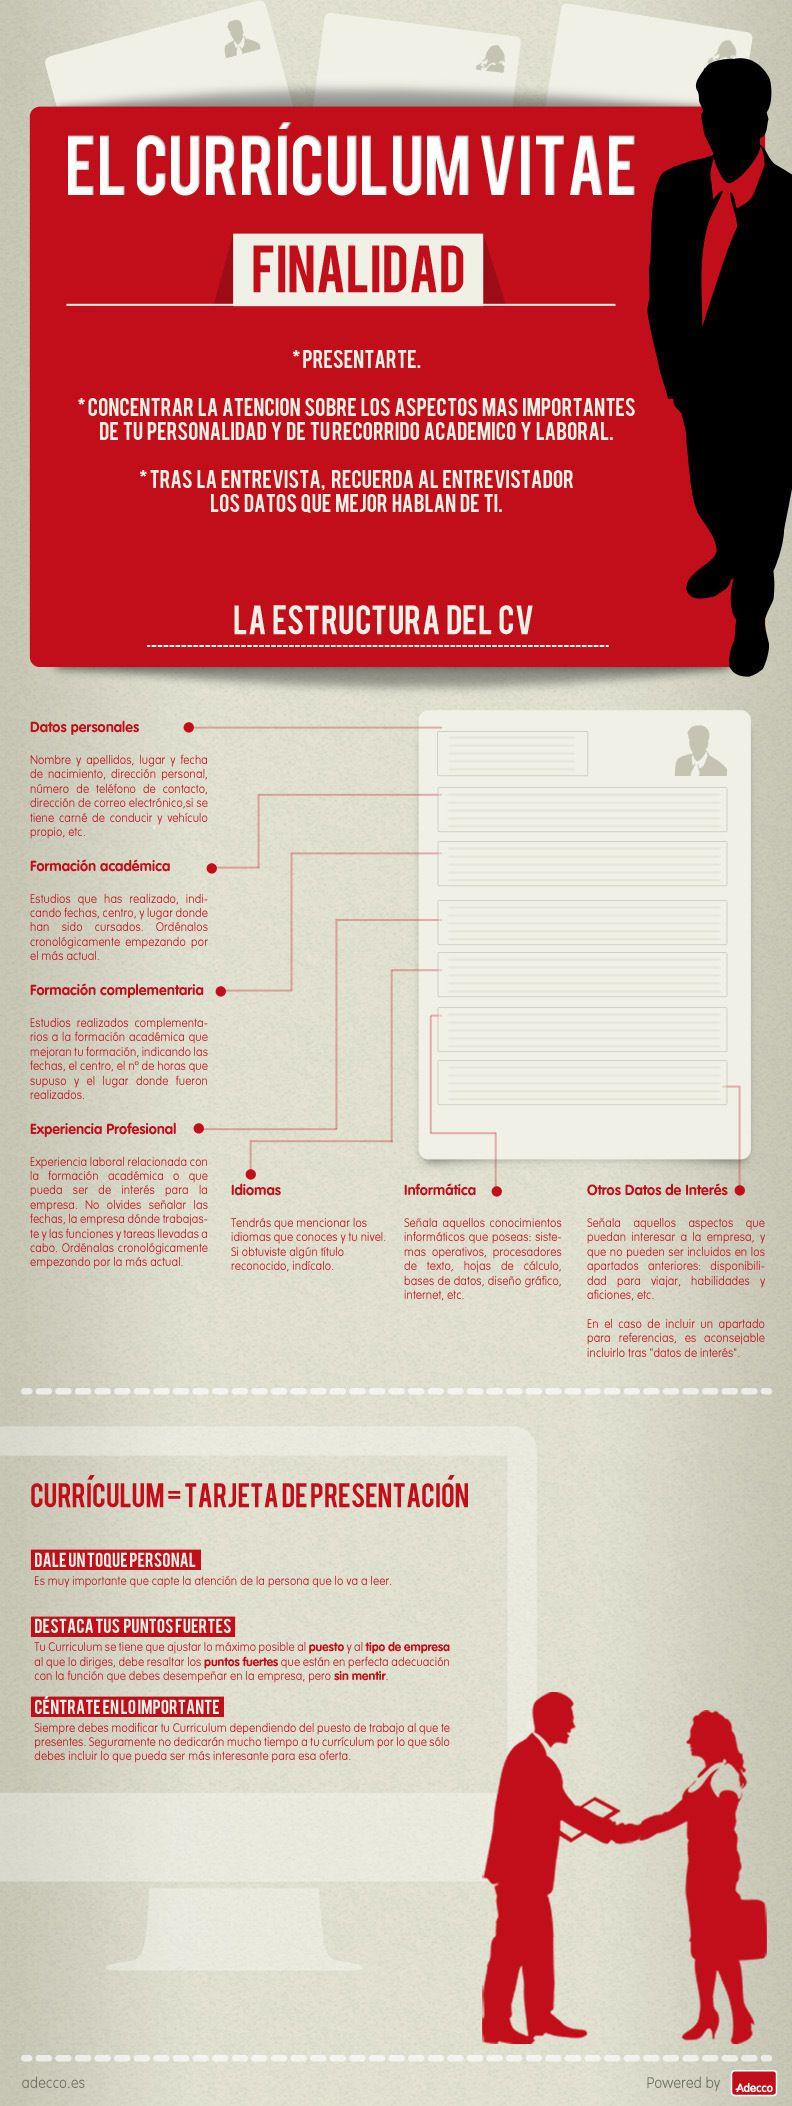 Cómo hacer bien un Curriculum Vitae #infografia #infographic ...